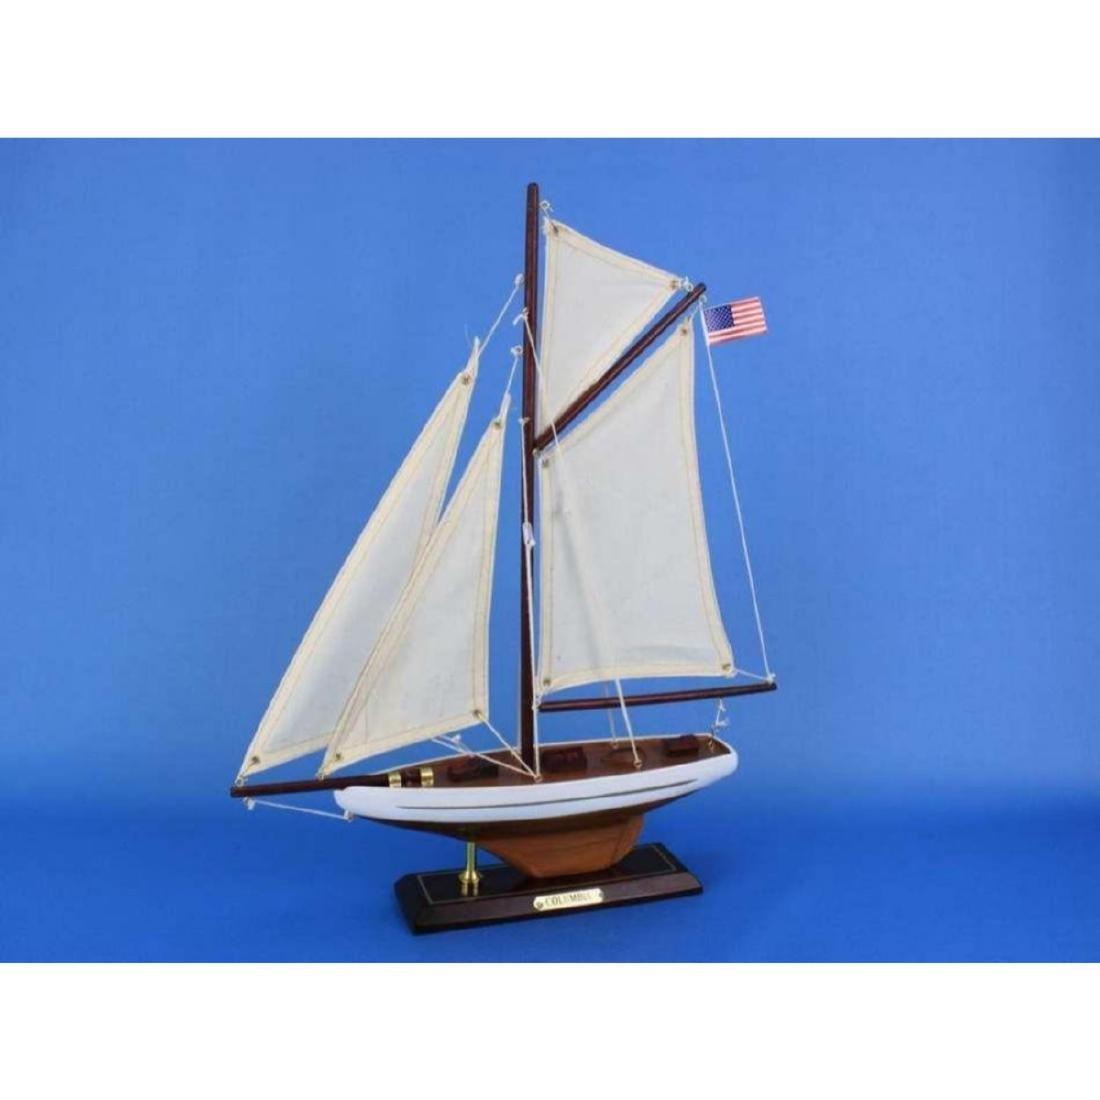 "Wooden Columbia Model Sailboat Decoration 16"" - 3"